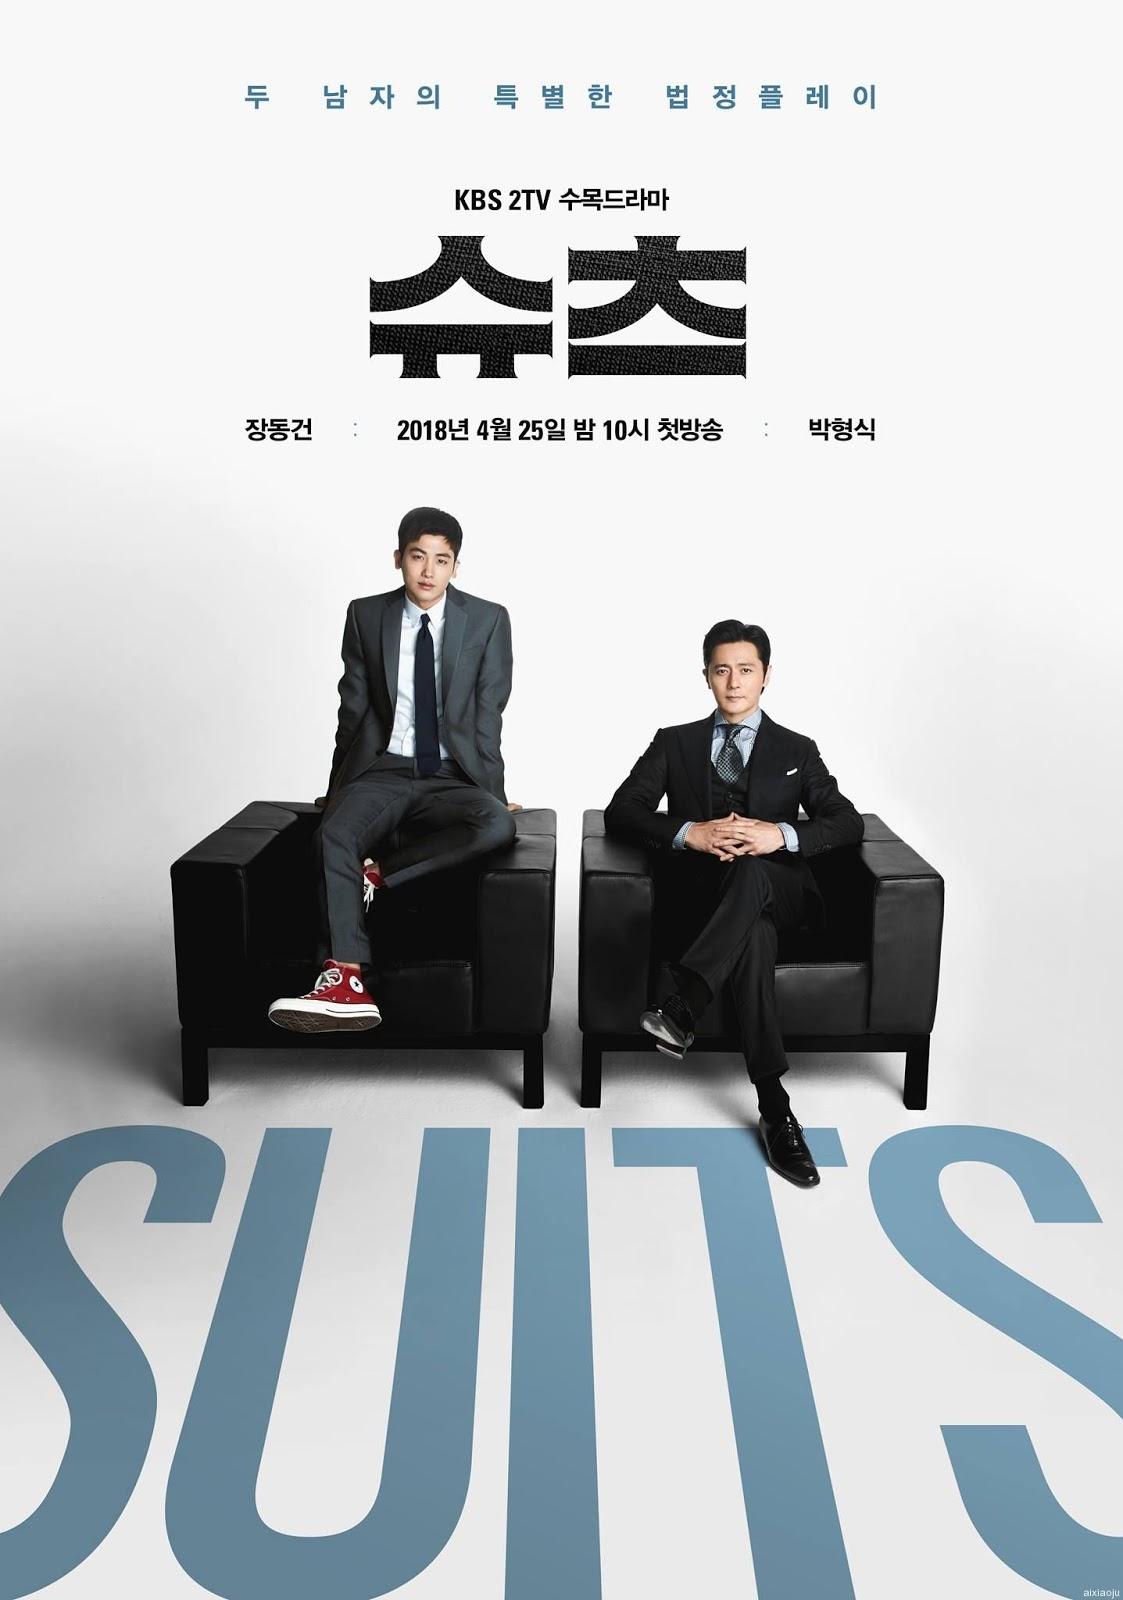 Phim Đấu Trí -Suits